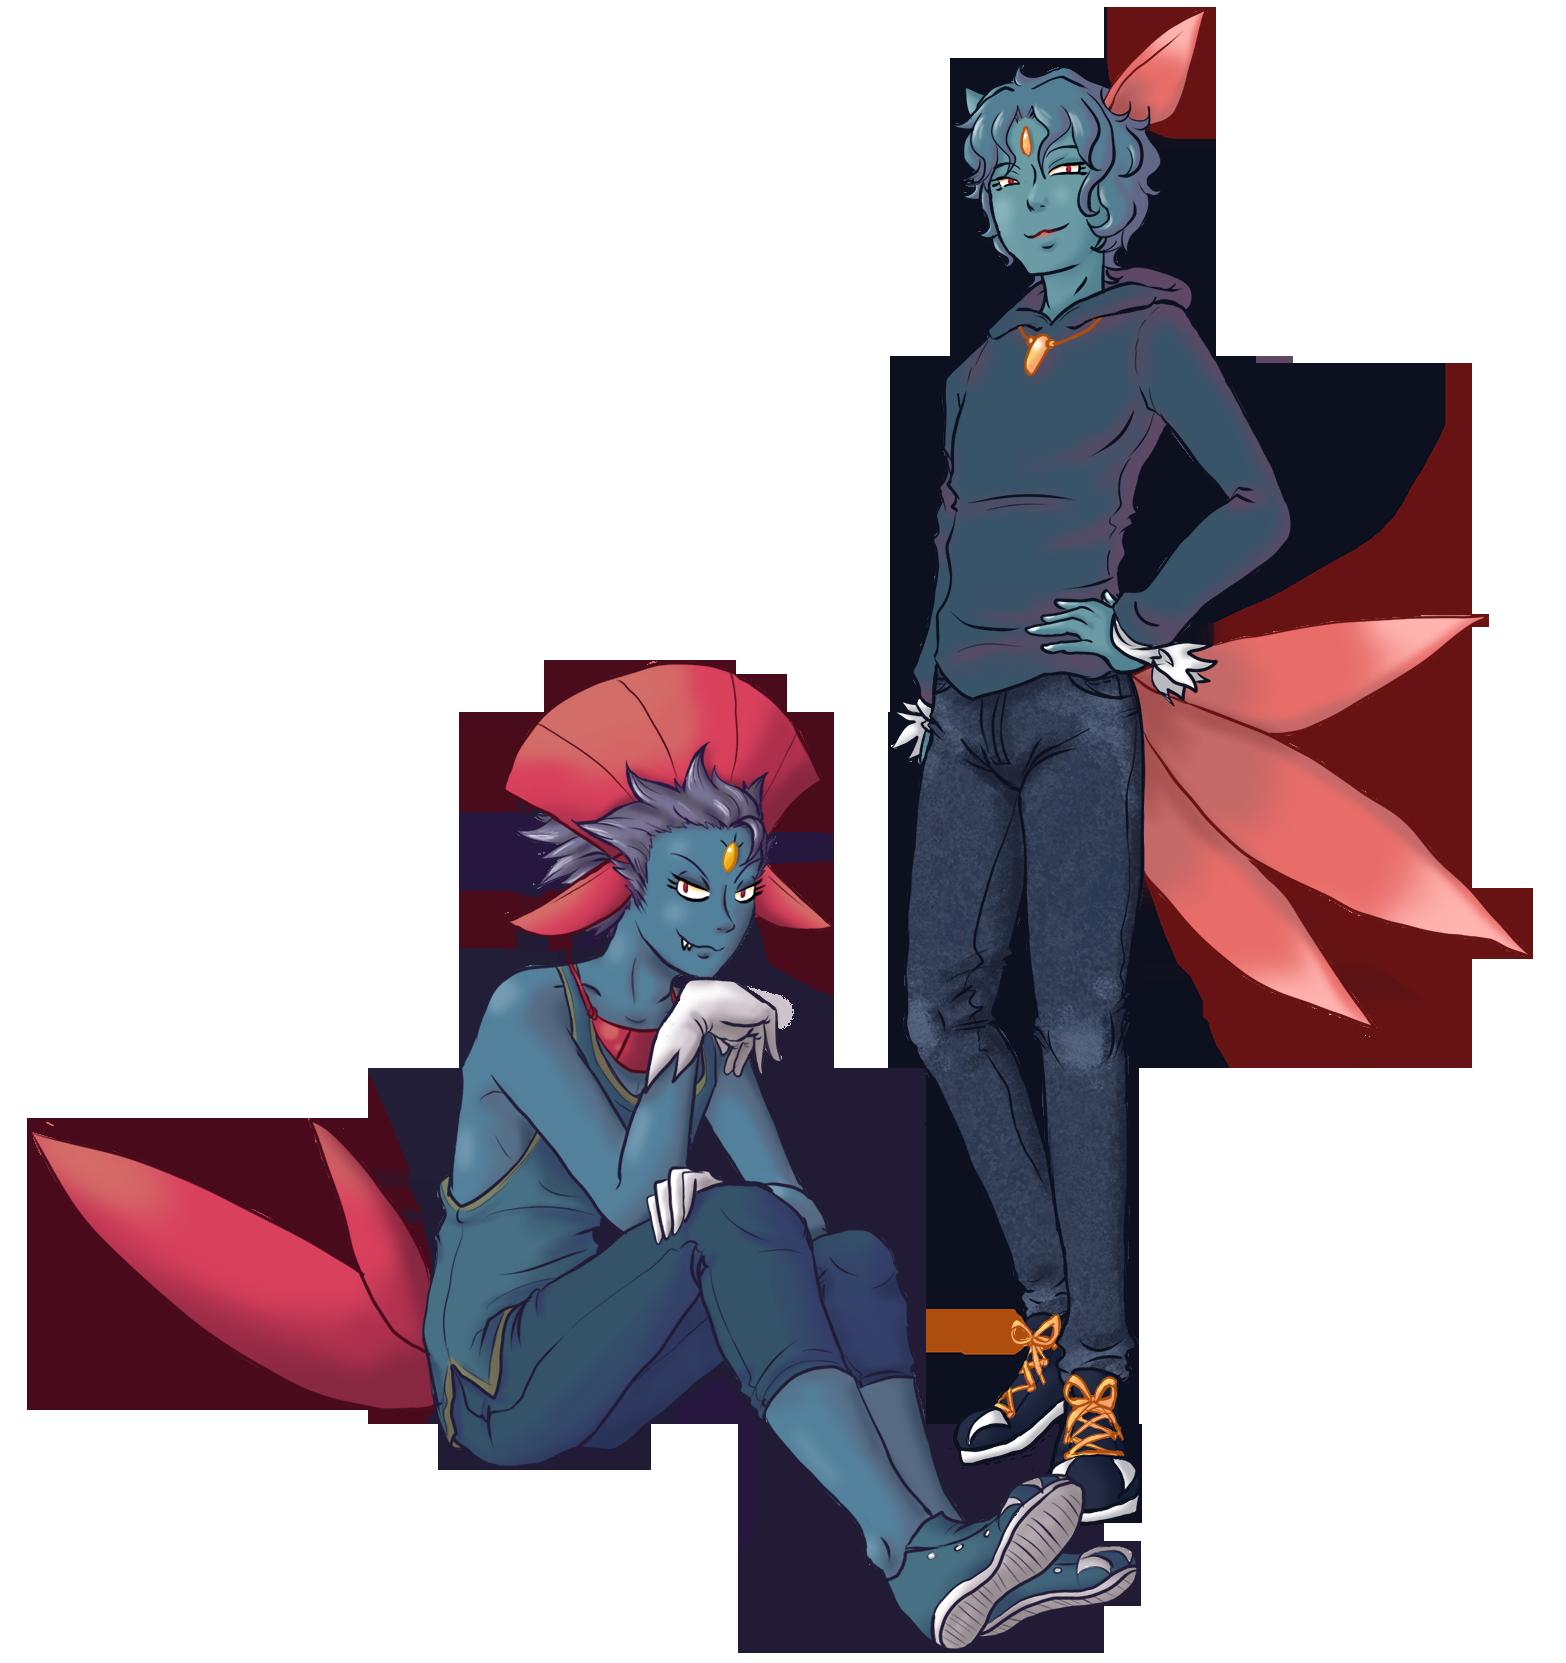 Pokemon Gijinka 215 461 by Akumabaka on DeviantArt